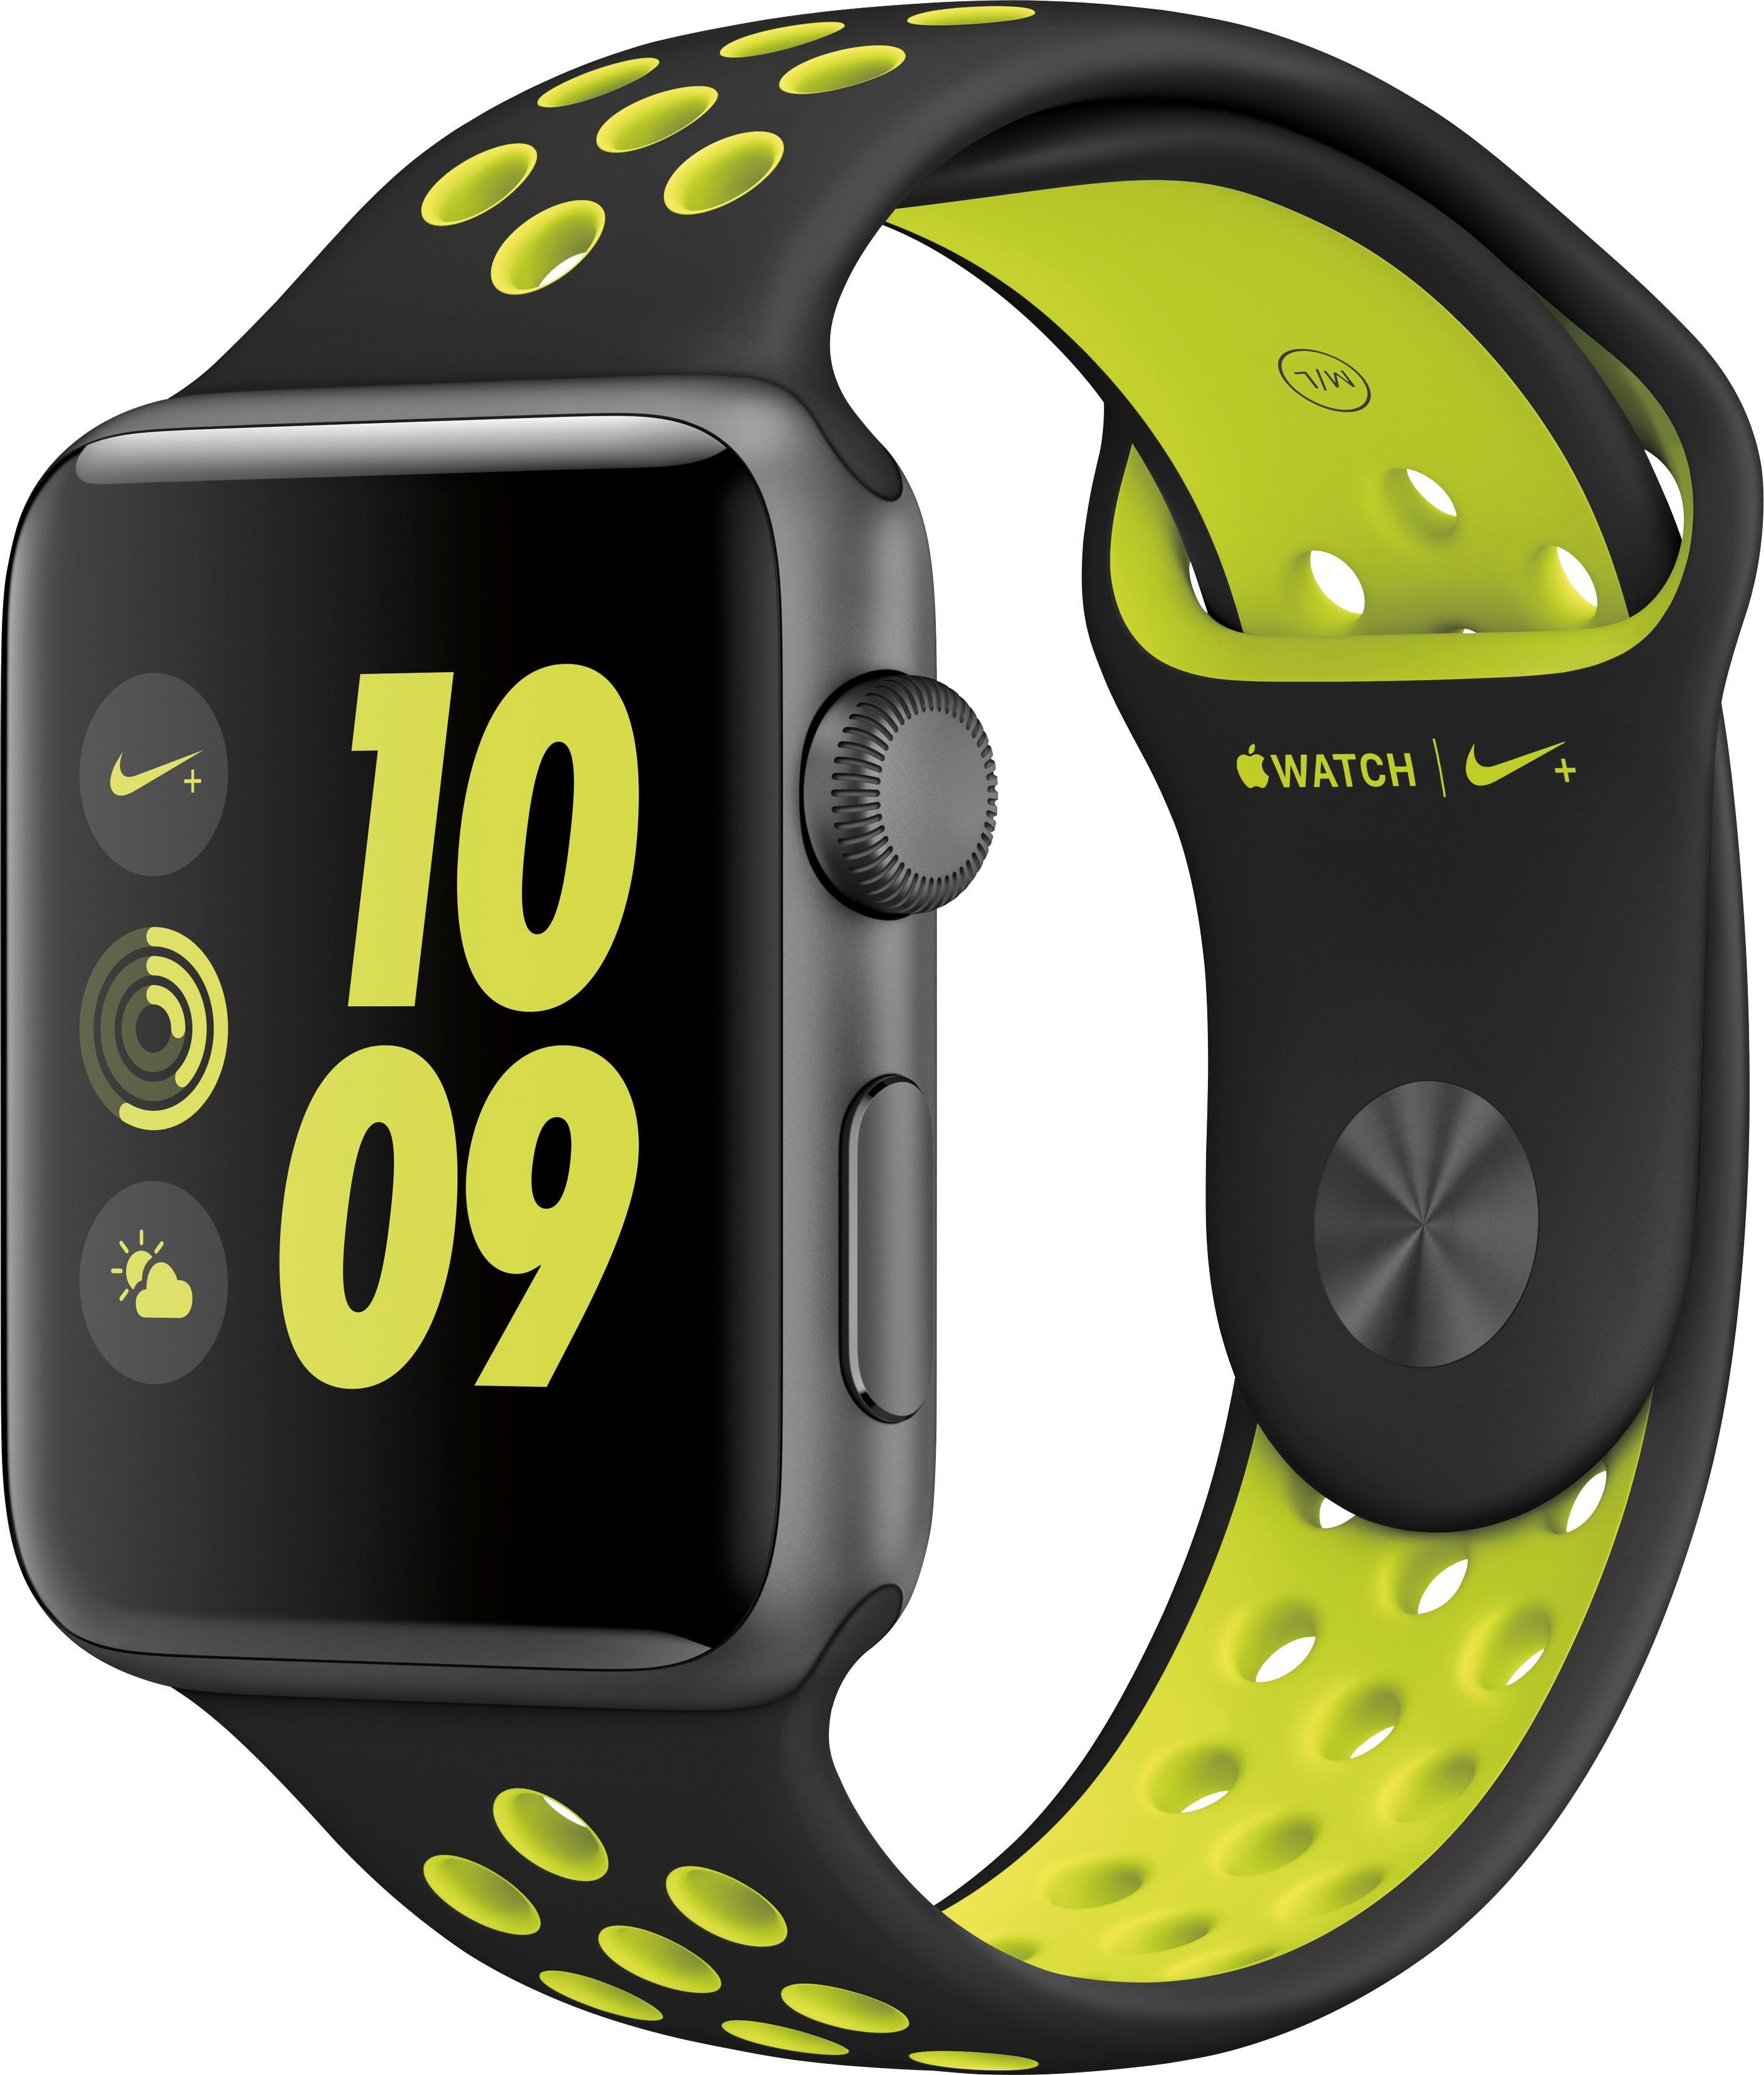 Apple - Apple Watch Nike+ 42mm Space Gray Aluminum Case Black/volt Nike Sport Band - Space Gray Aluminum 5547500